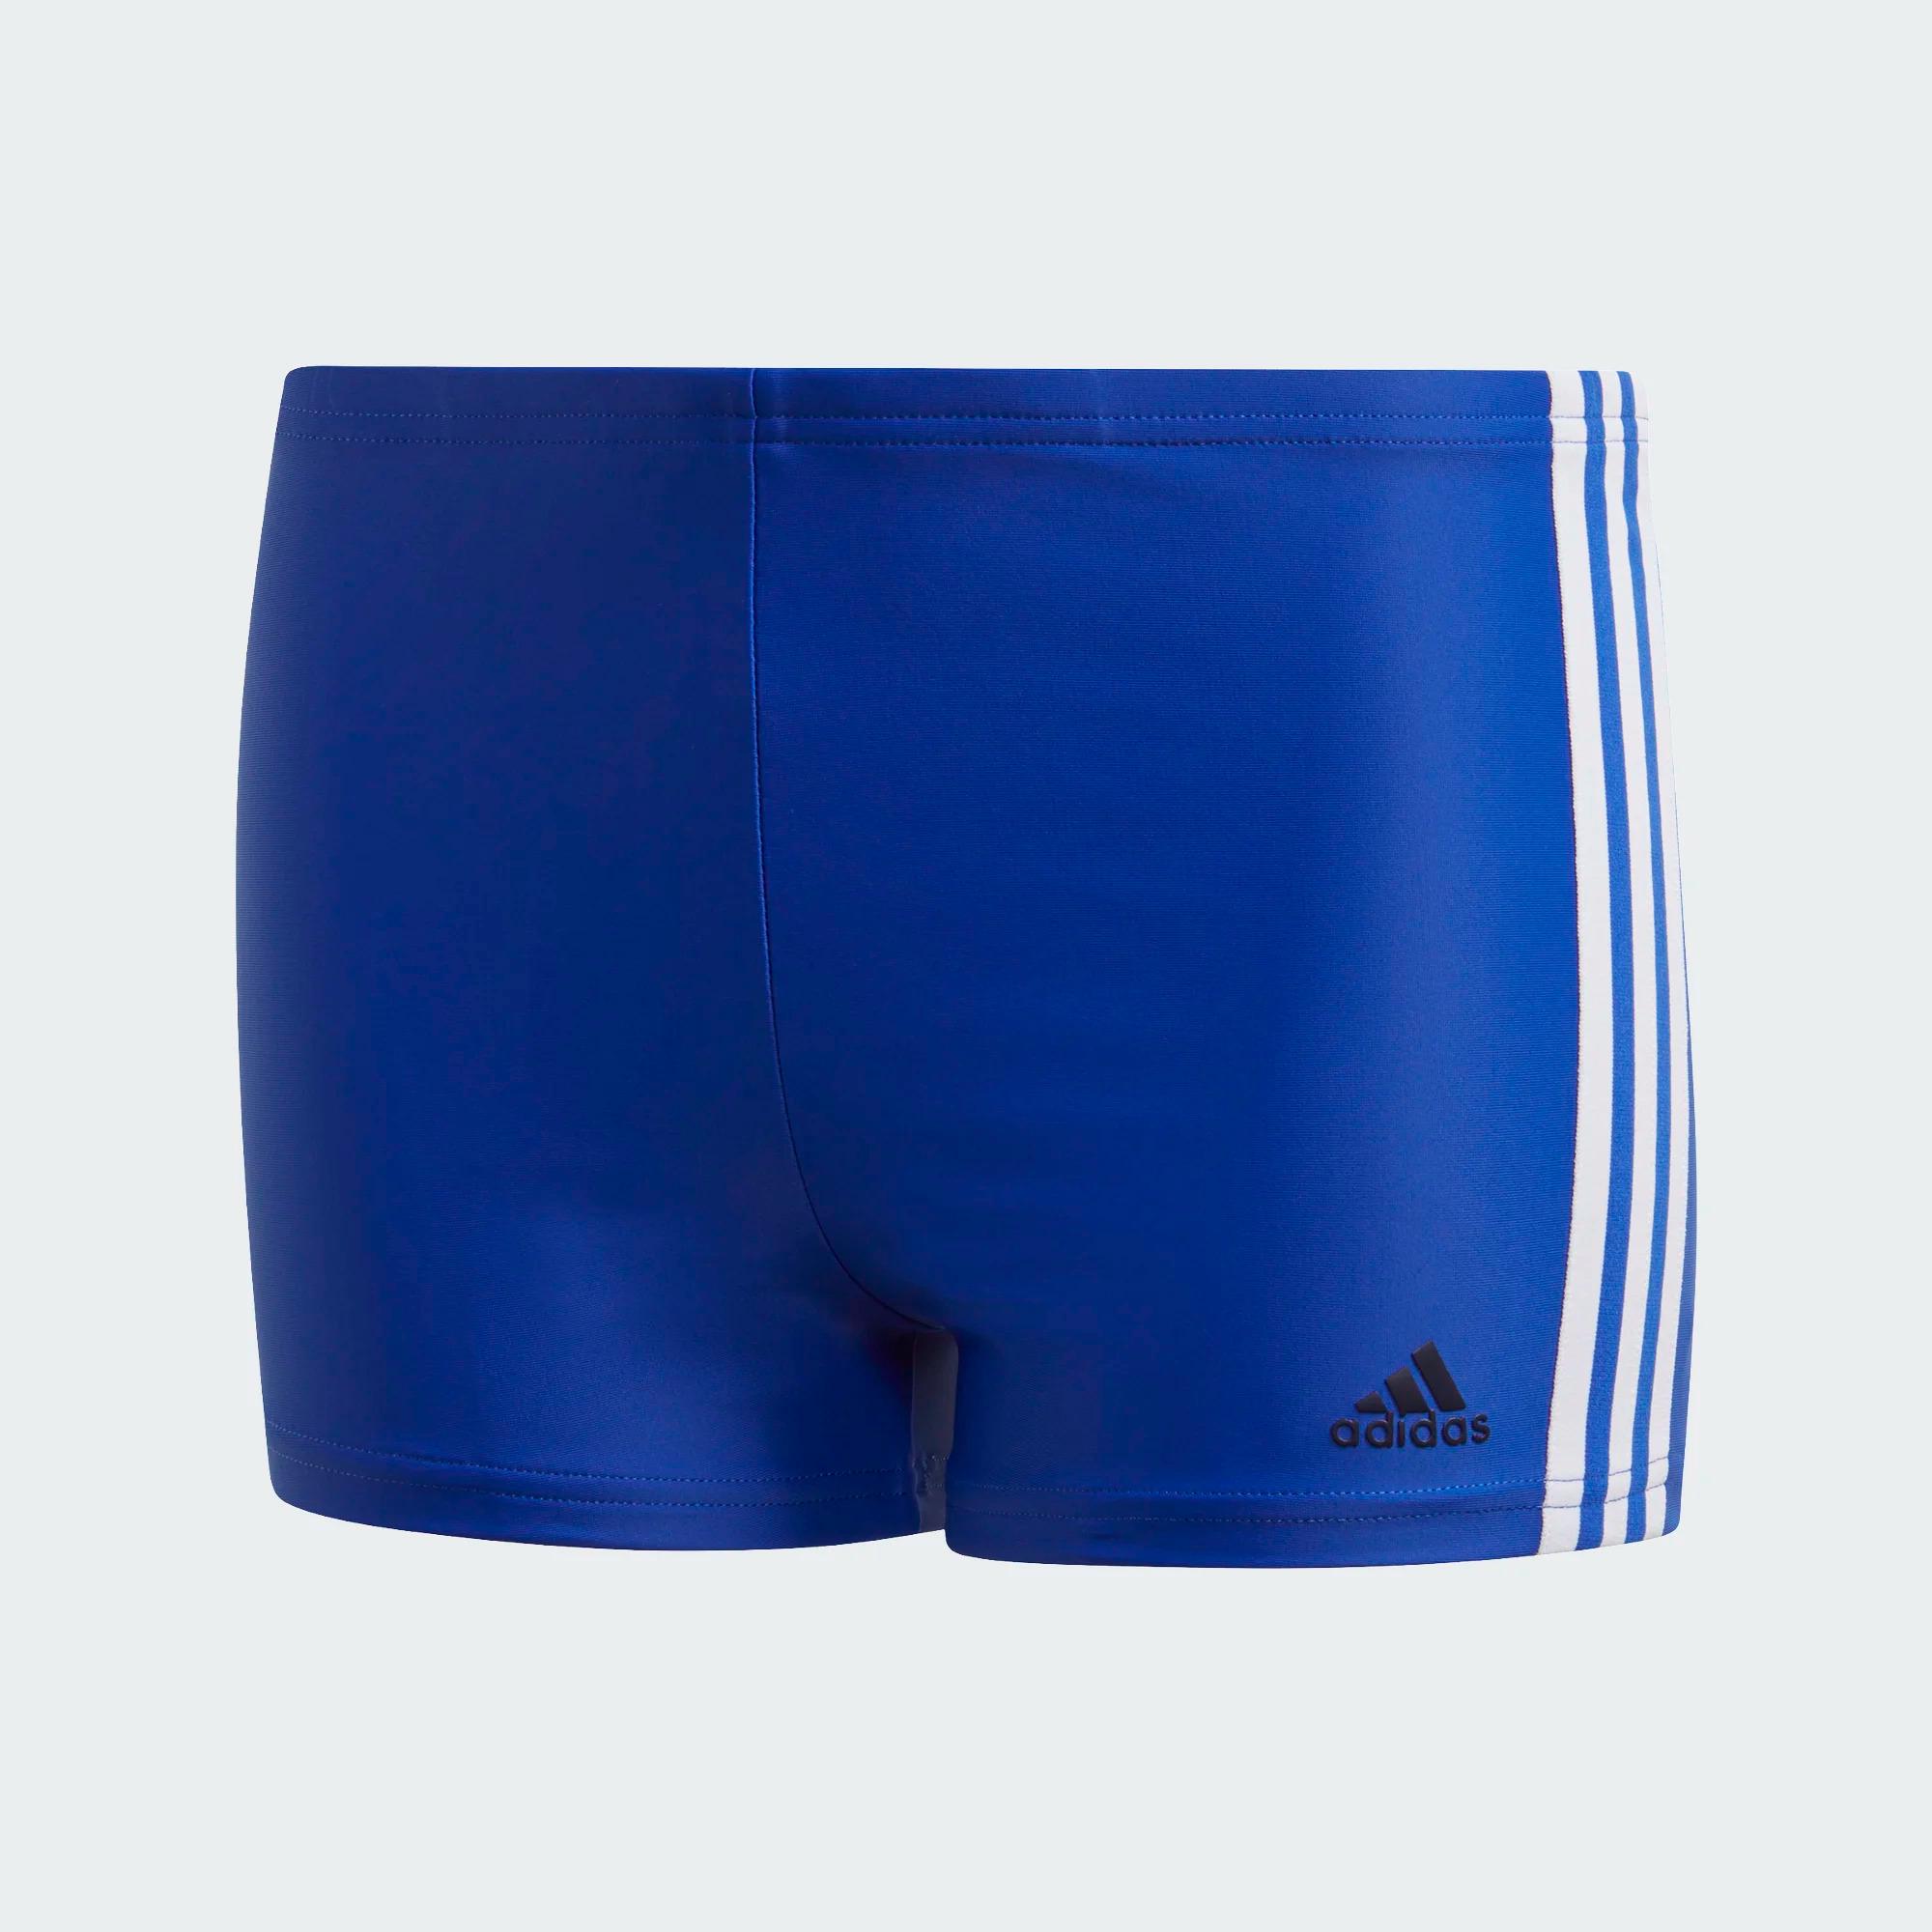 Adidas 3-Streifen Boxer-Badehose - blau/weiß